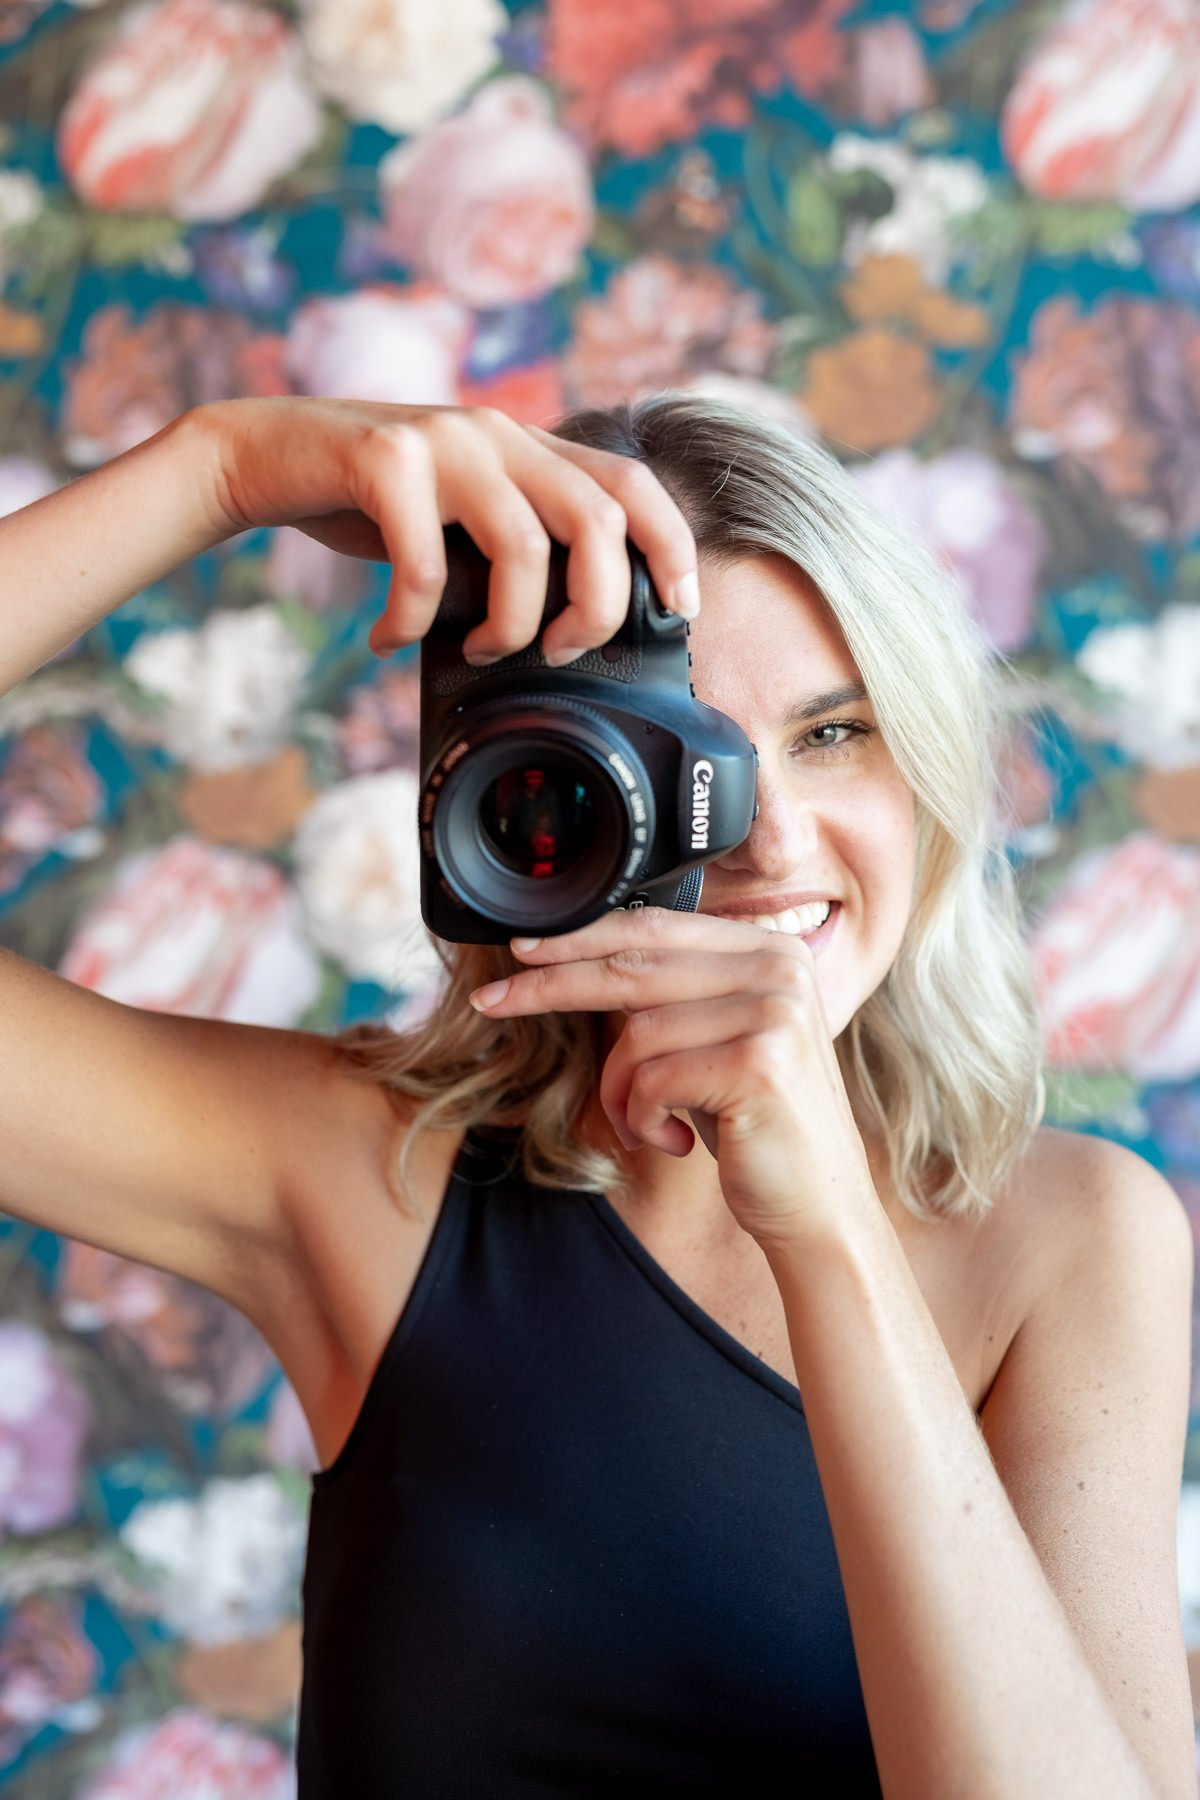 Jenna business portrait photoshoot